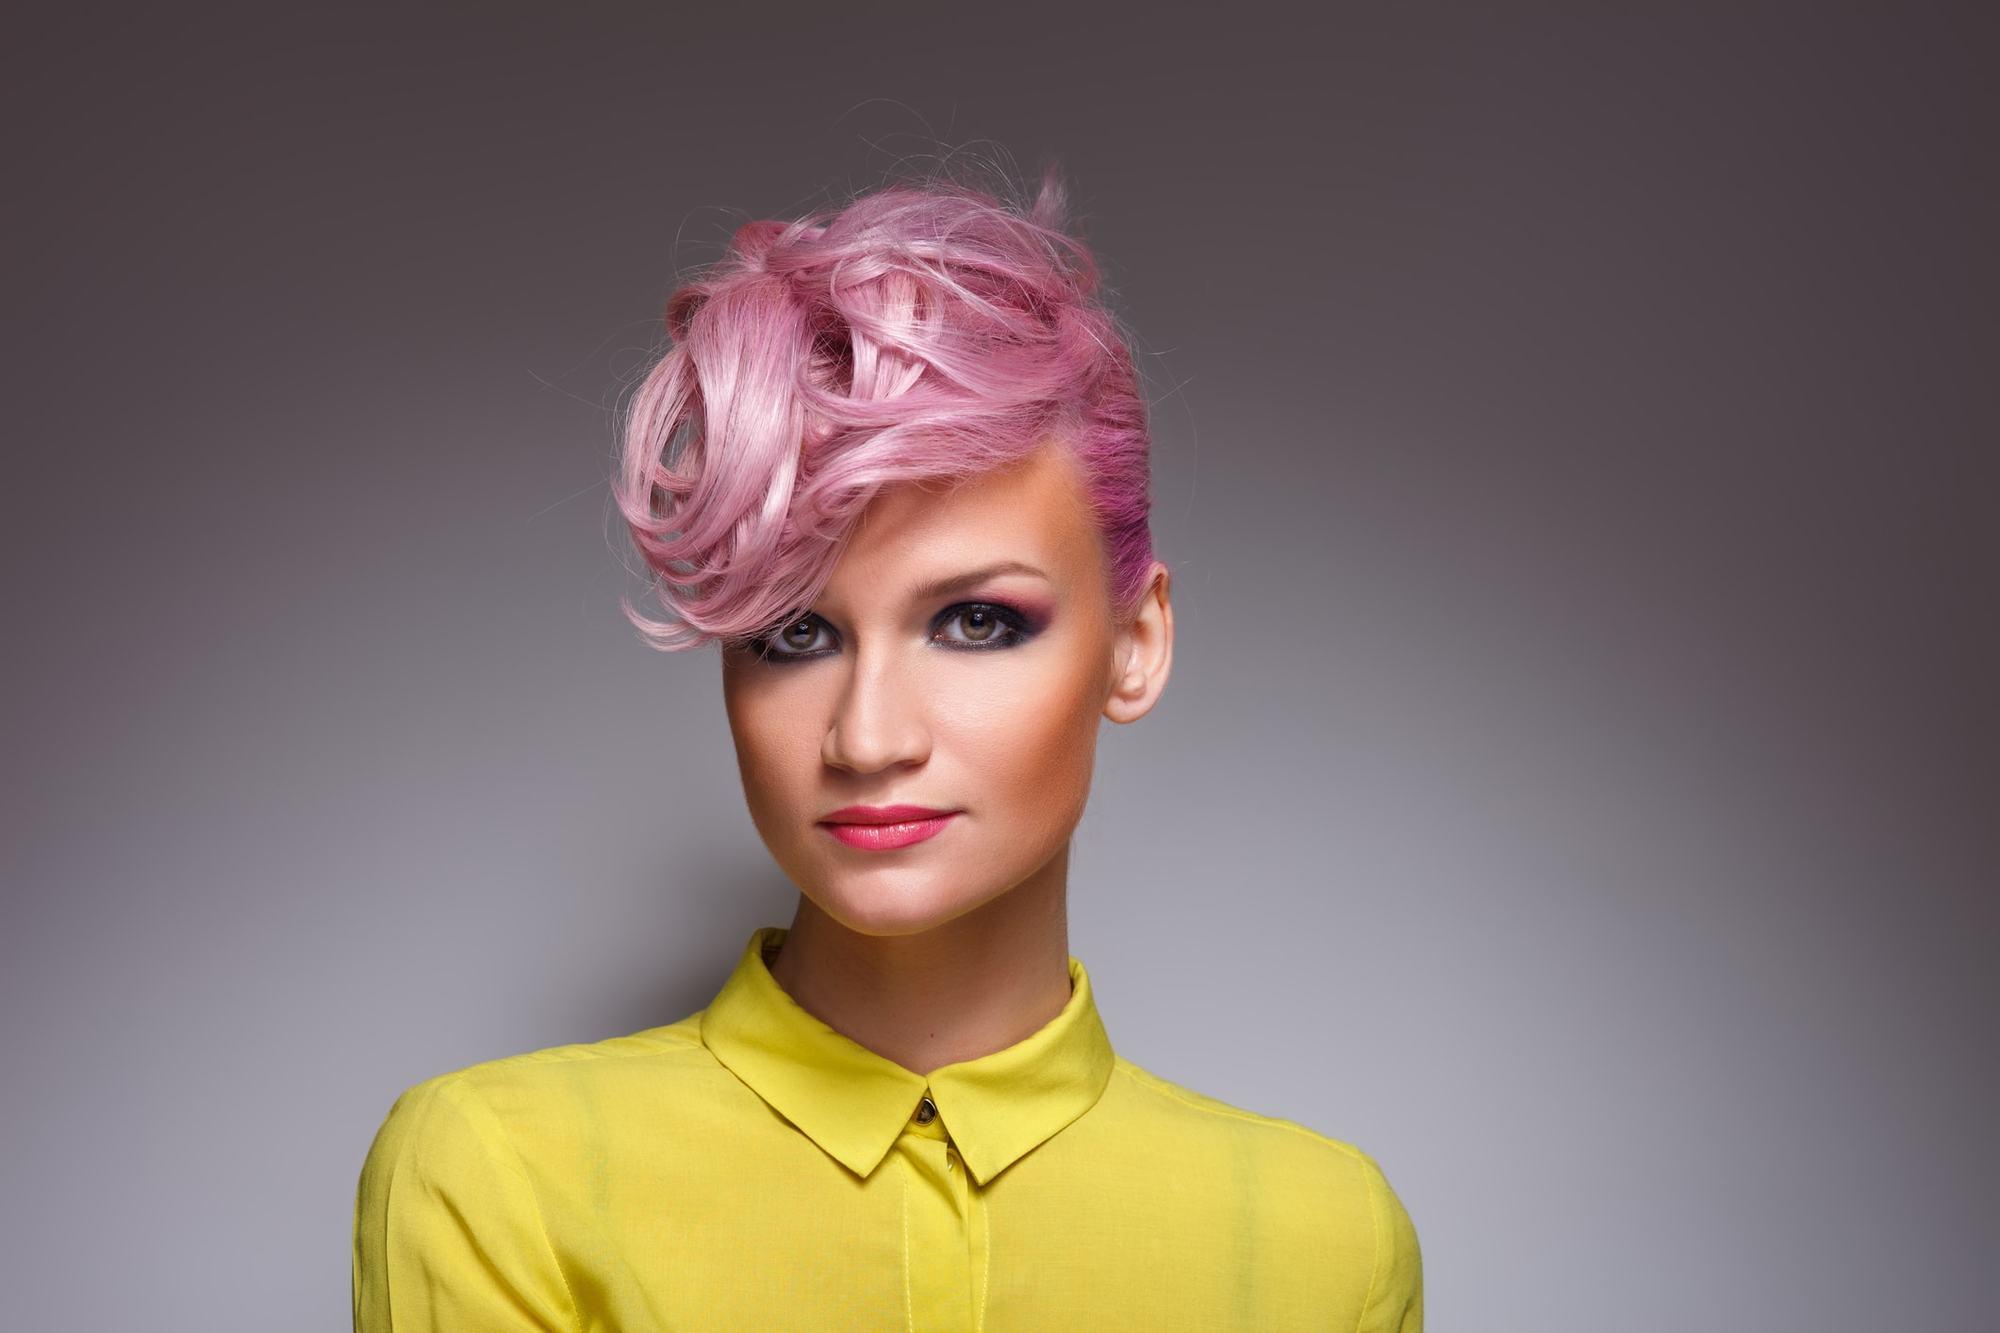 pink hair short blown out